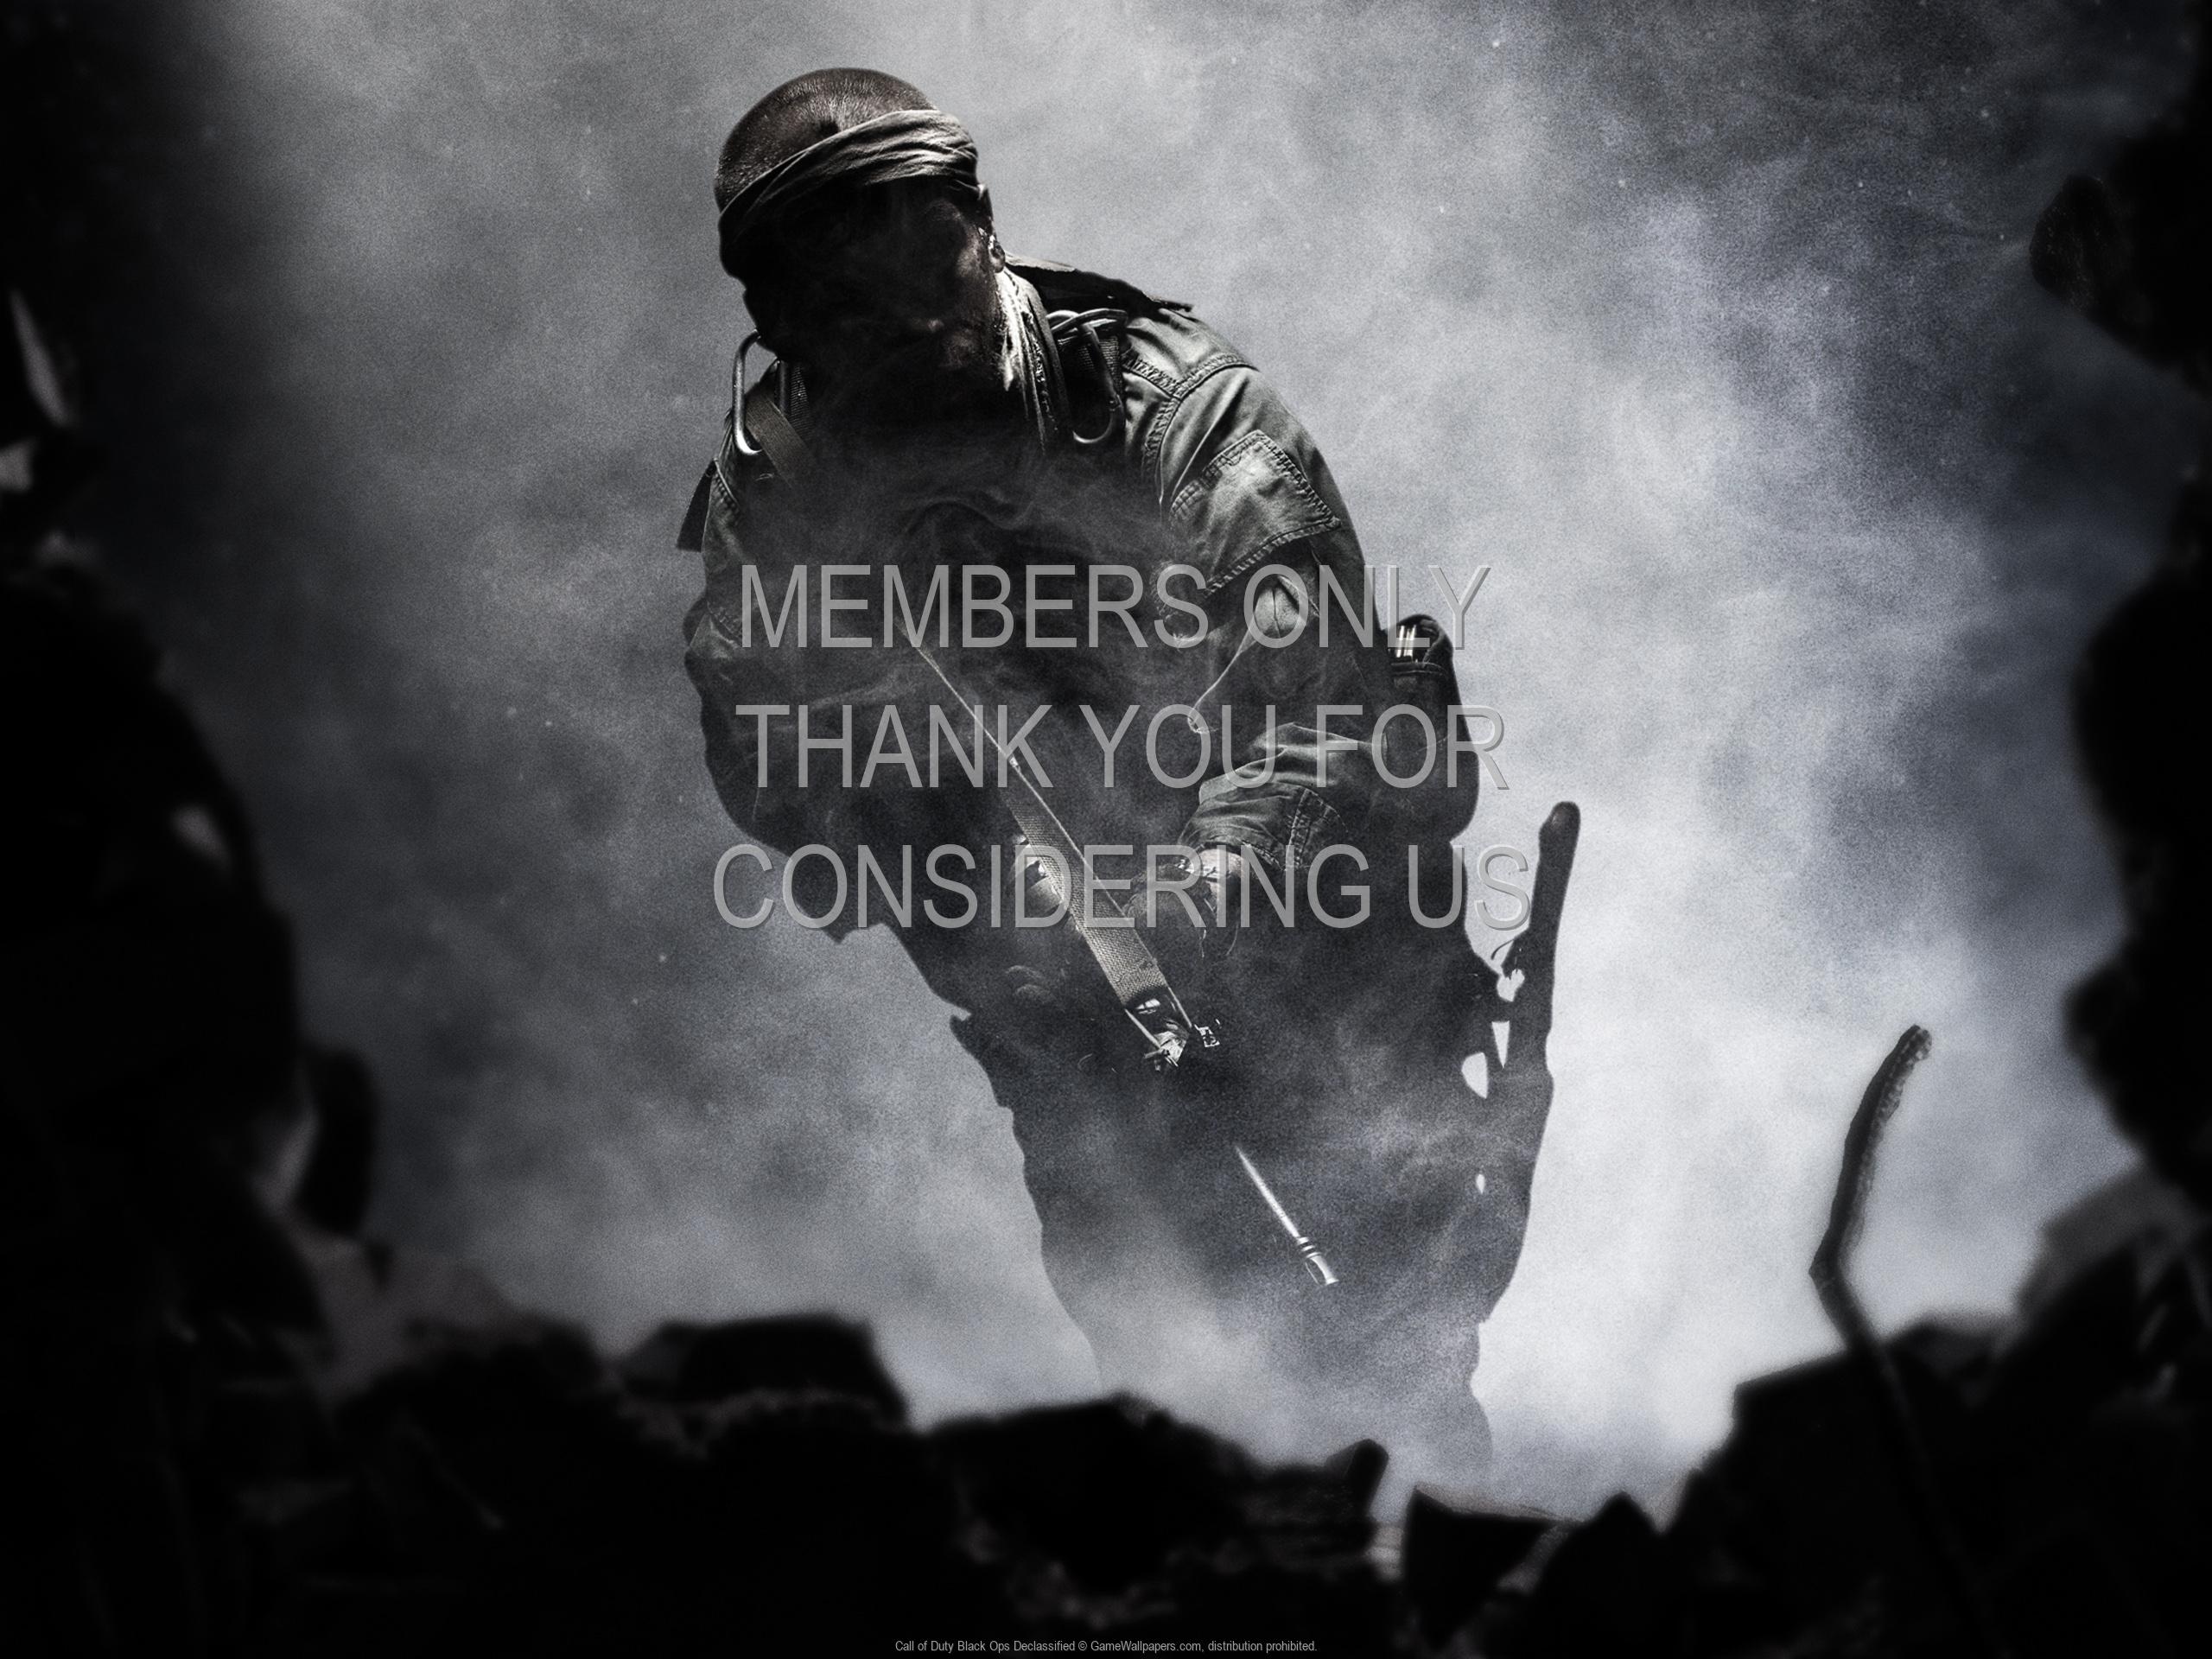 Call of Duty Black Ops Declassified wallpaper 01 1920x1080 2560x1920